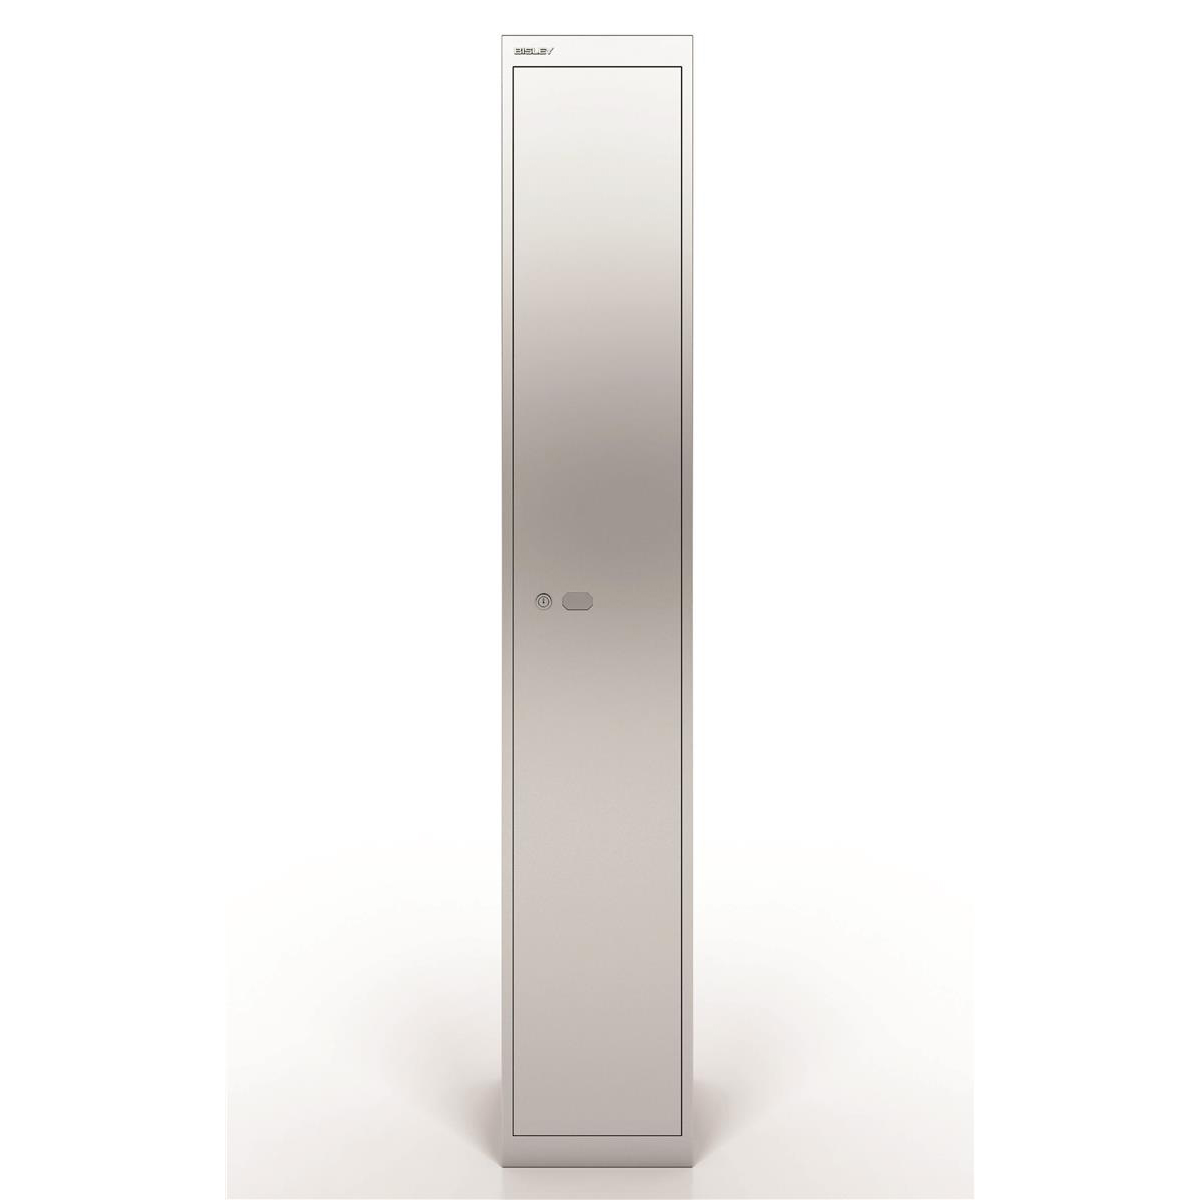 Lockers Bisley Locker 1 Door Silver 305d Ref CLK121-arn